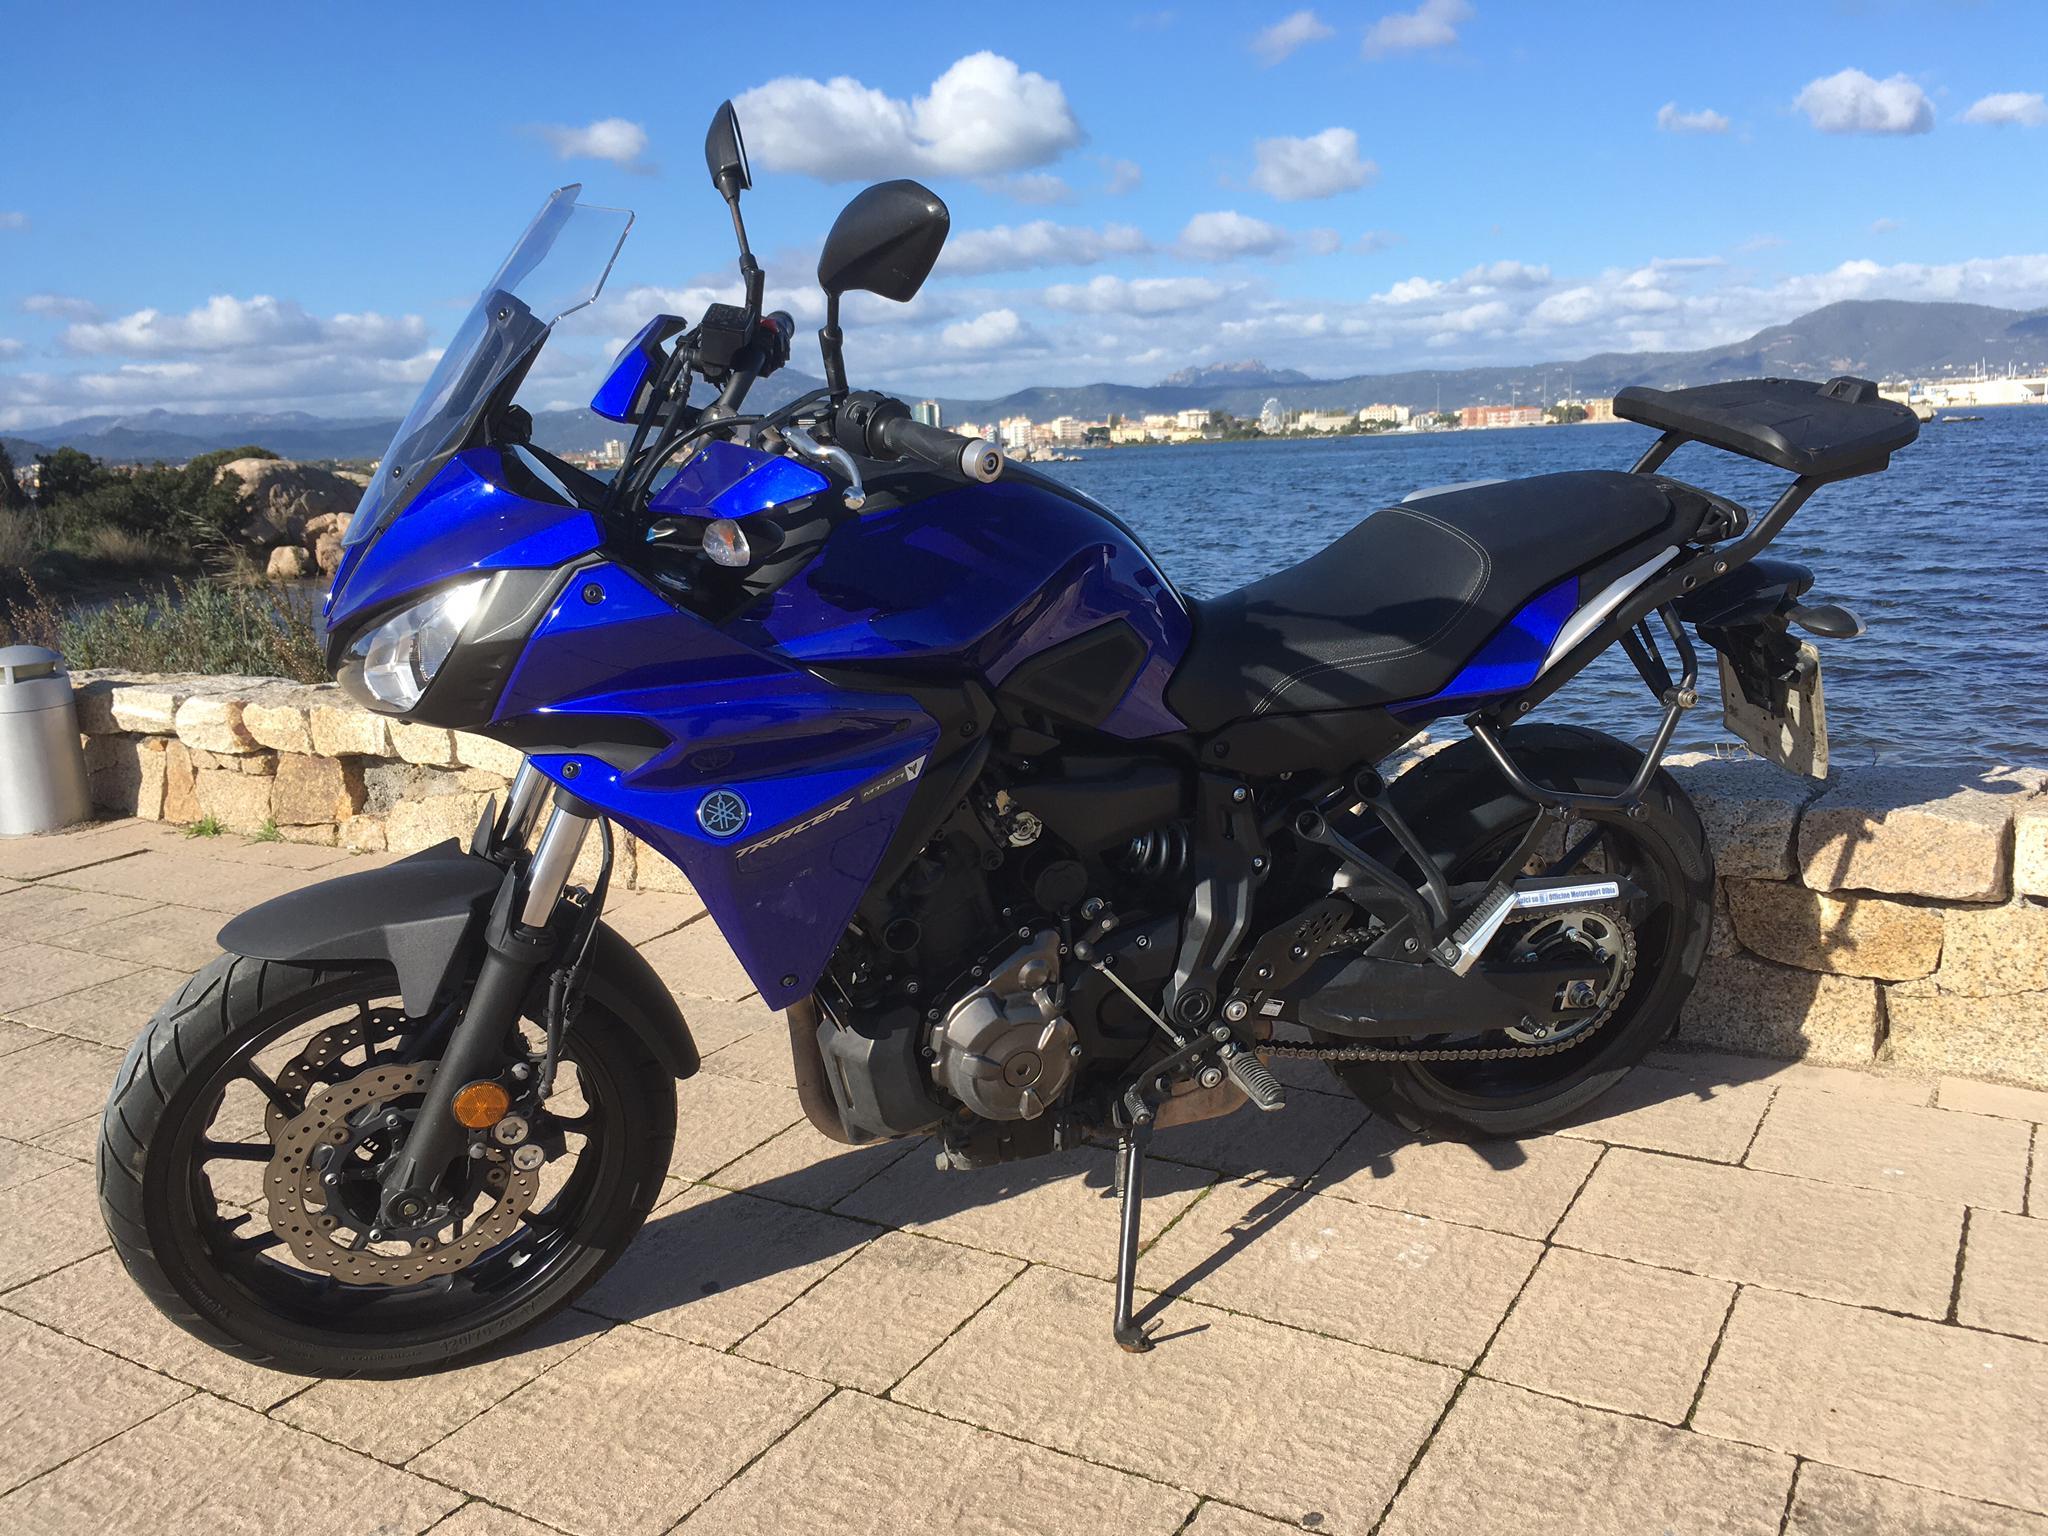 a Yamaha Tracer 700 - blau mit Topcase